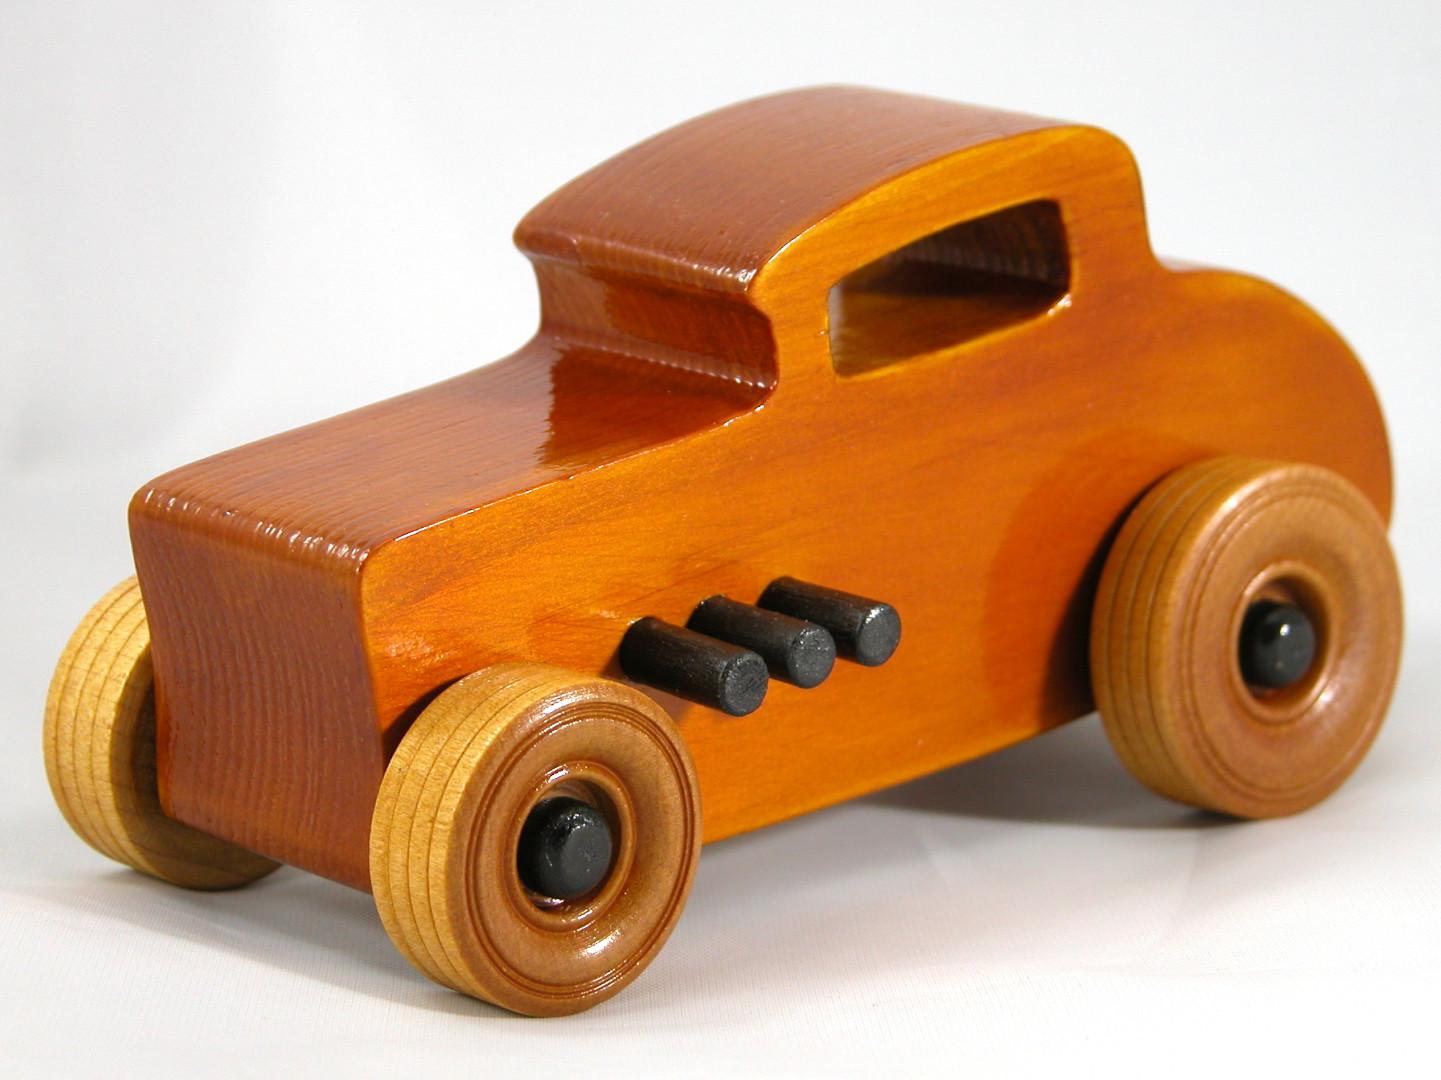 20171015-154533 Wood Toy Cars - Wooden Cars - Wood Toys - Wooden Car - Wood Toy Car - Hot Rod - 1932 Ford - 32 Deuce Coupe - Little Deuce Coupe - Roadster - Race Car.jpg